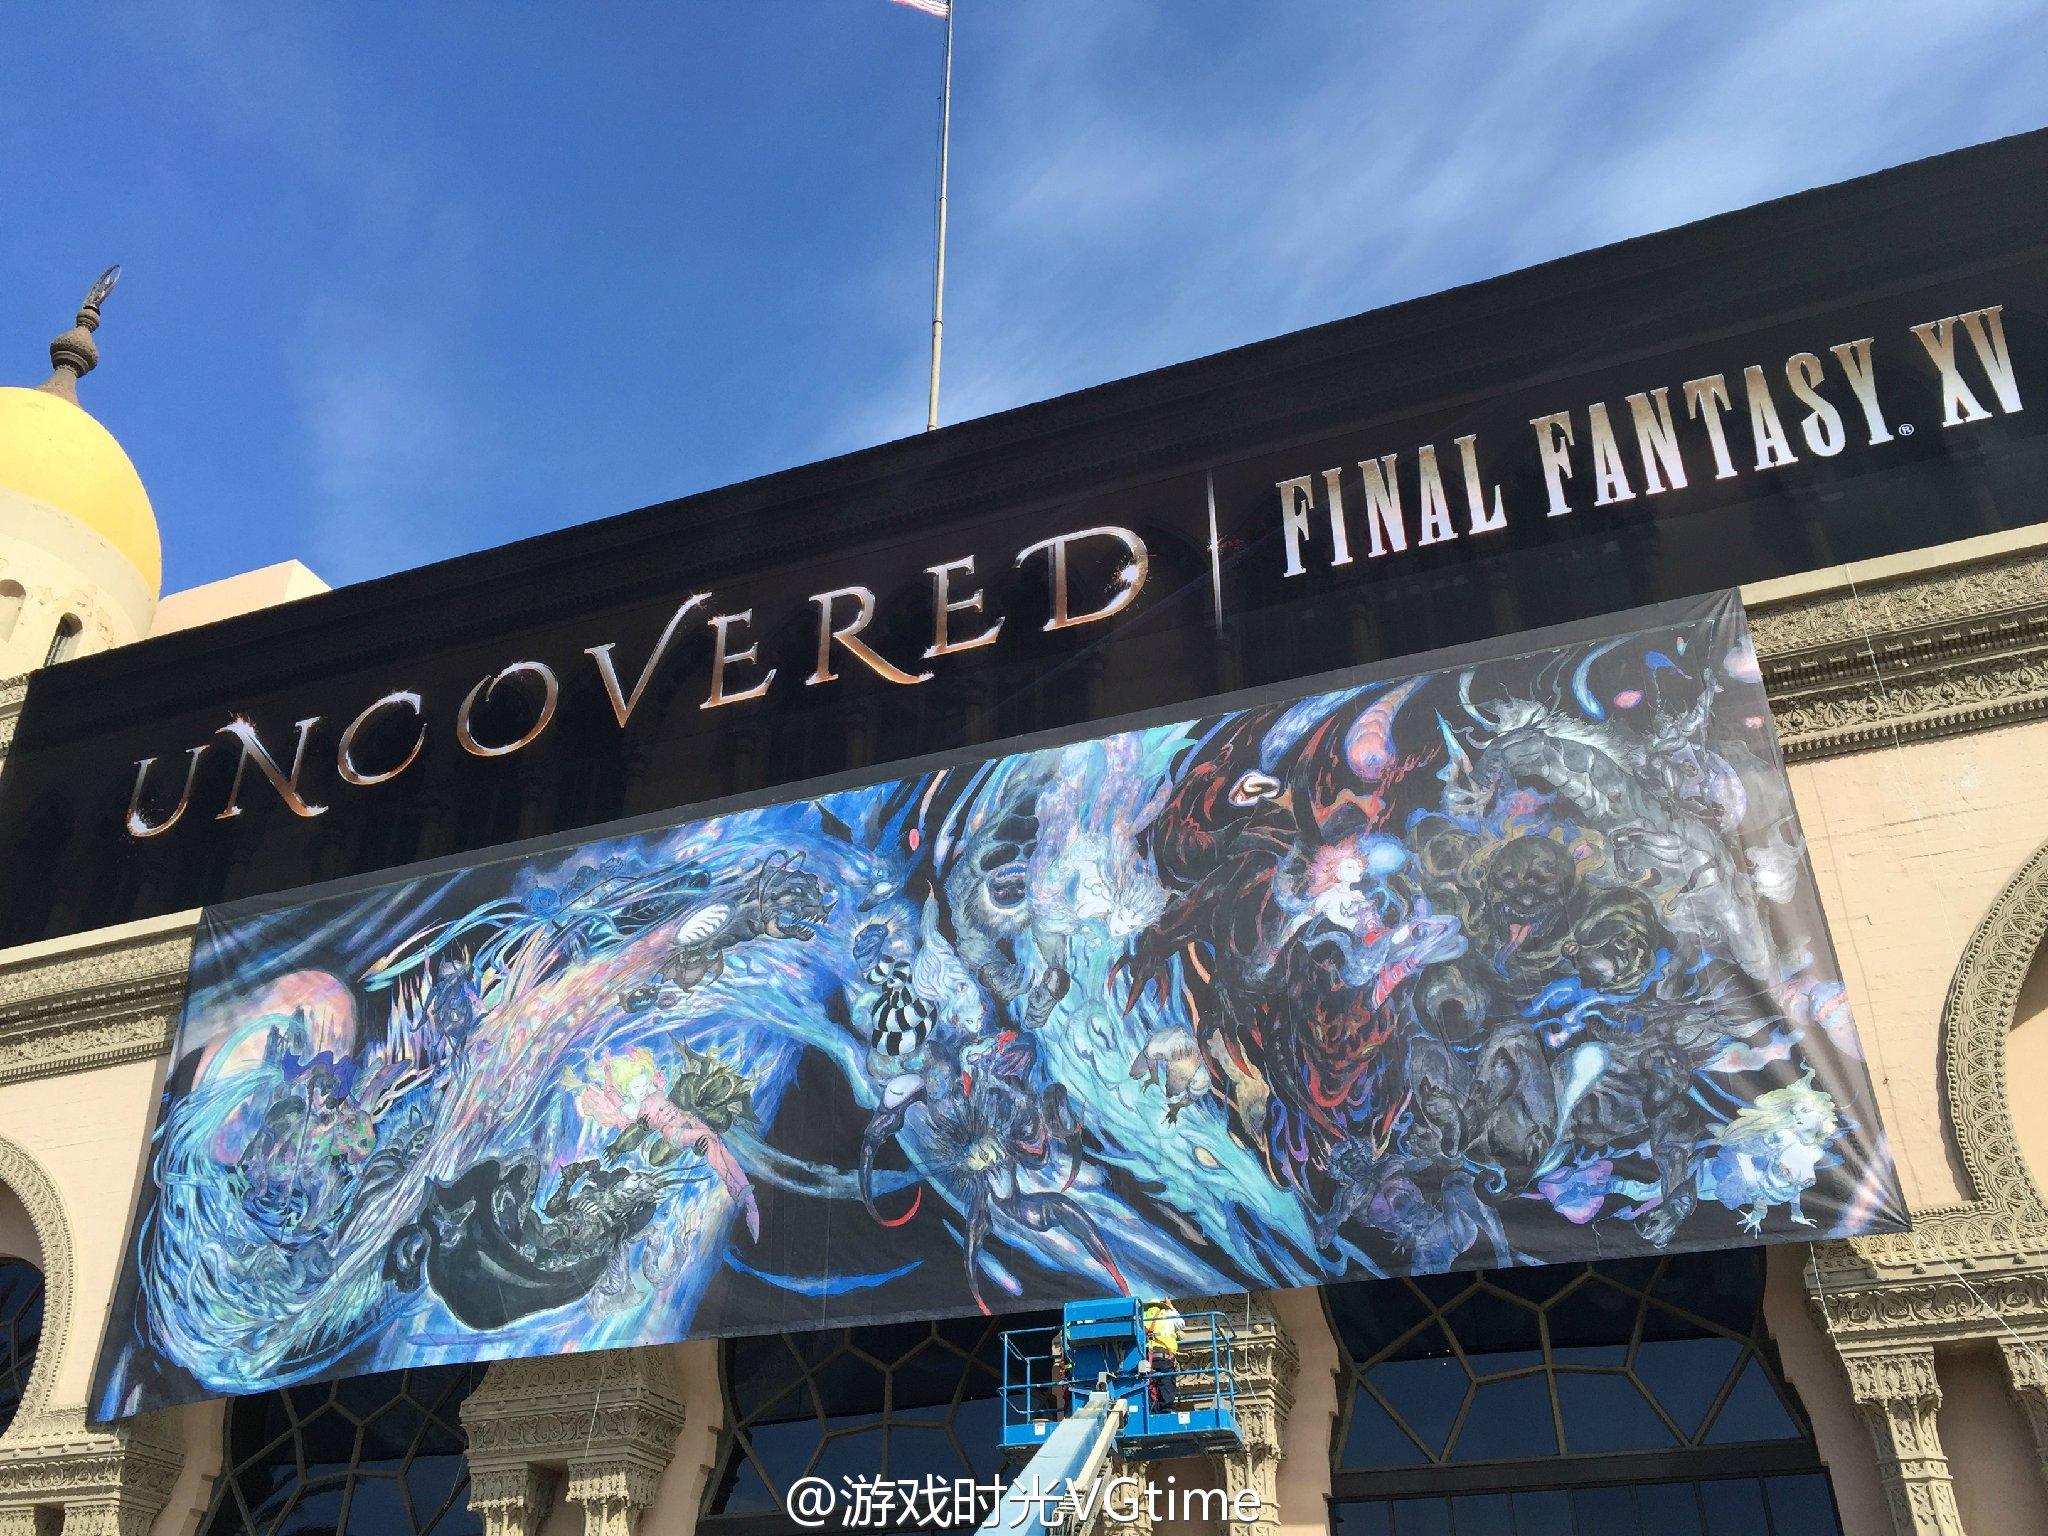 FFXV-Uncovered-Yoshitaka-Amano